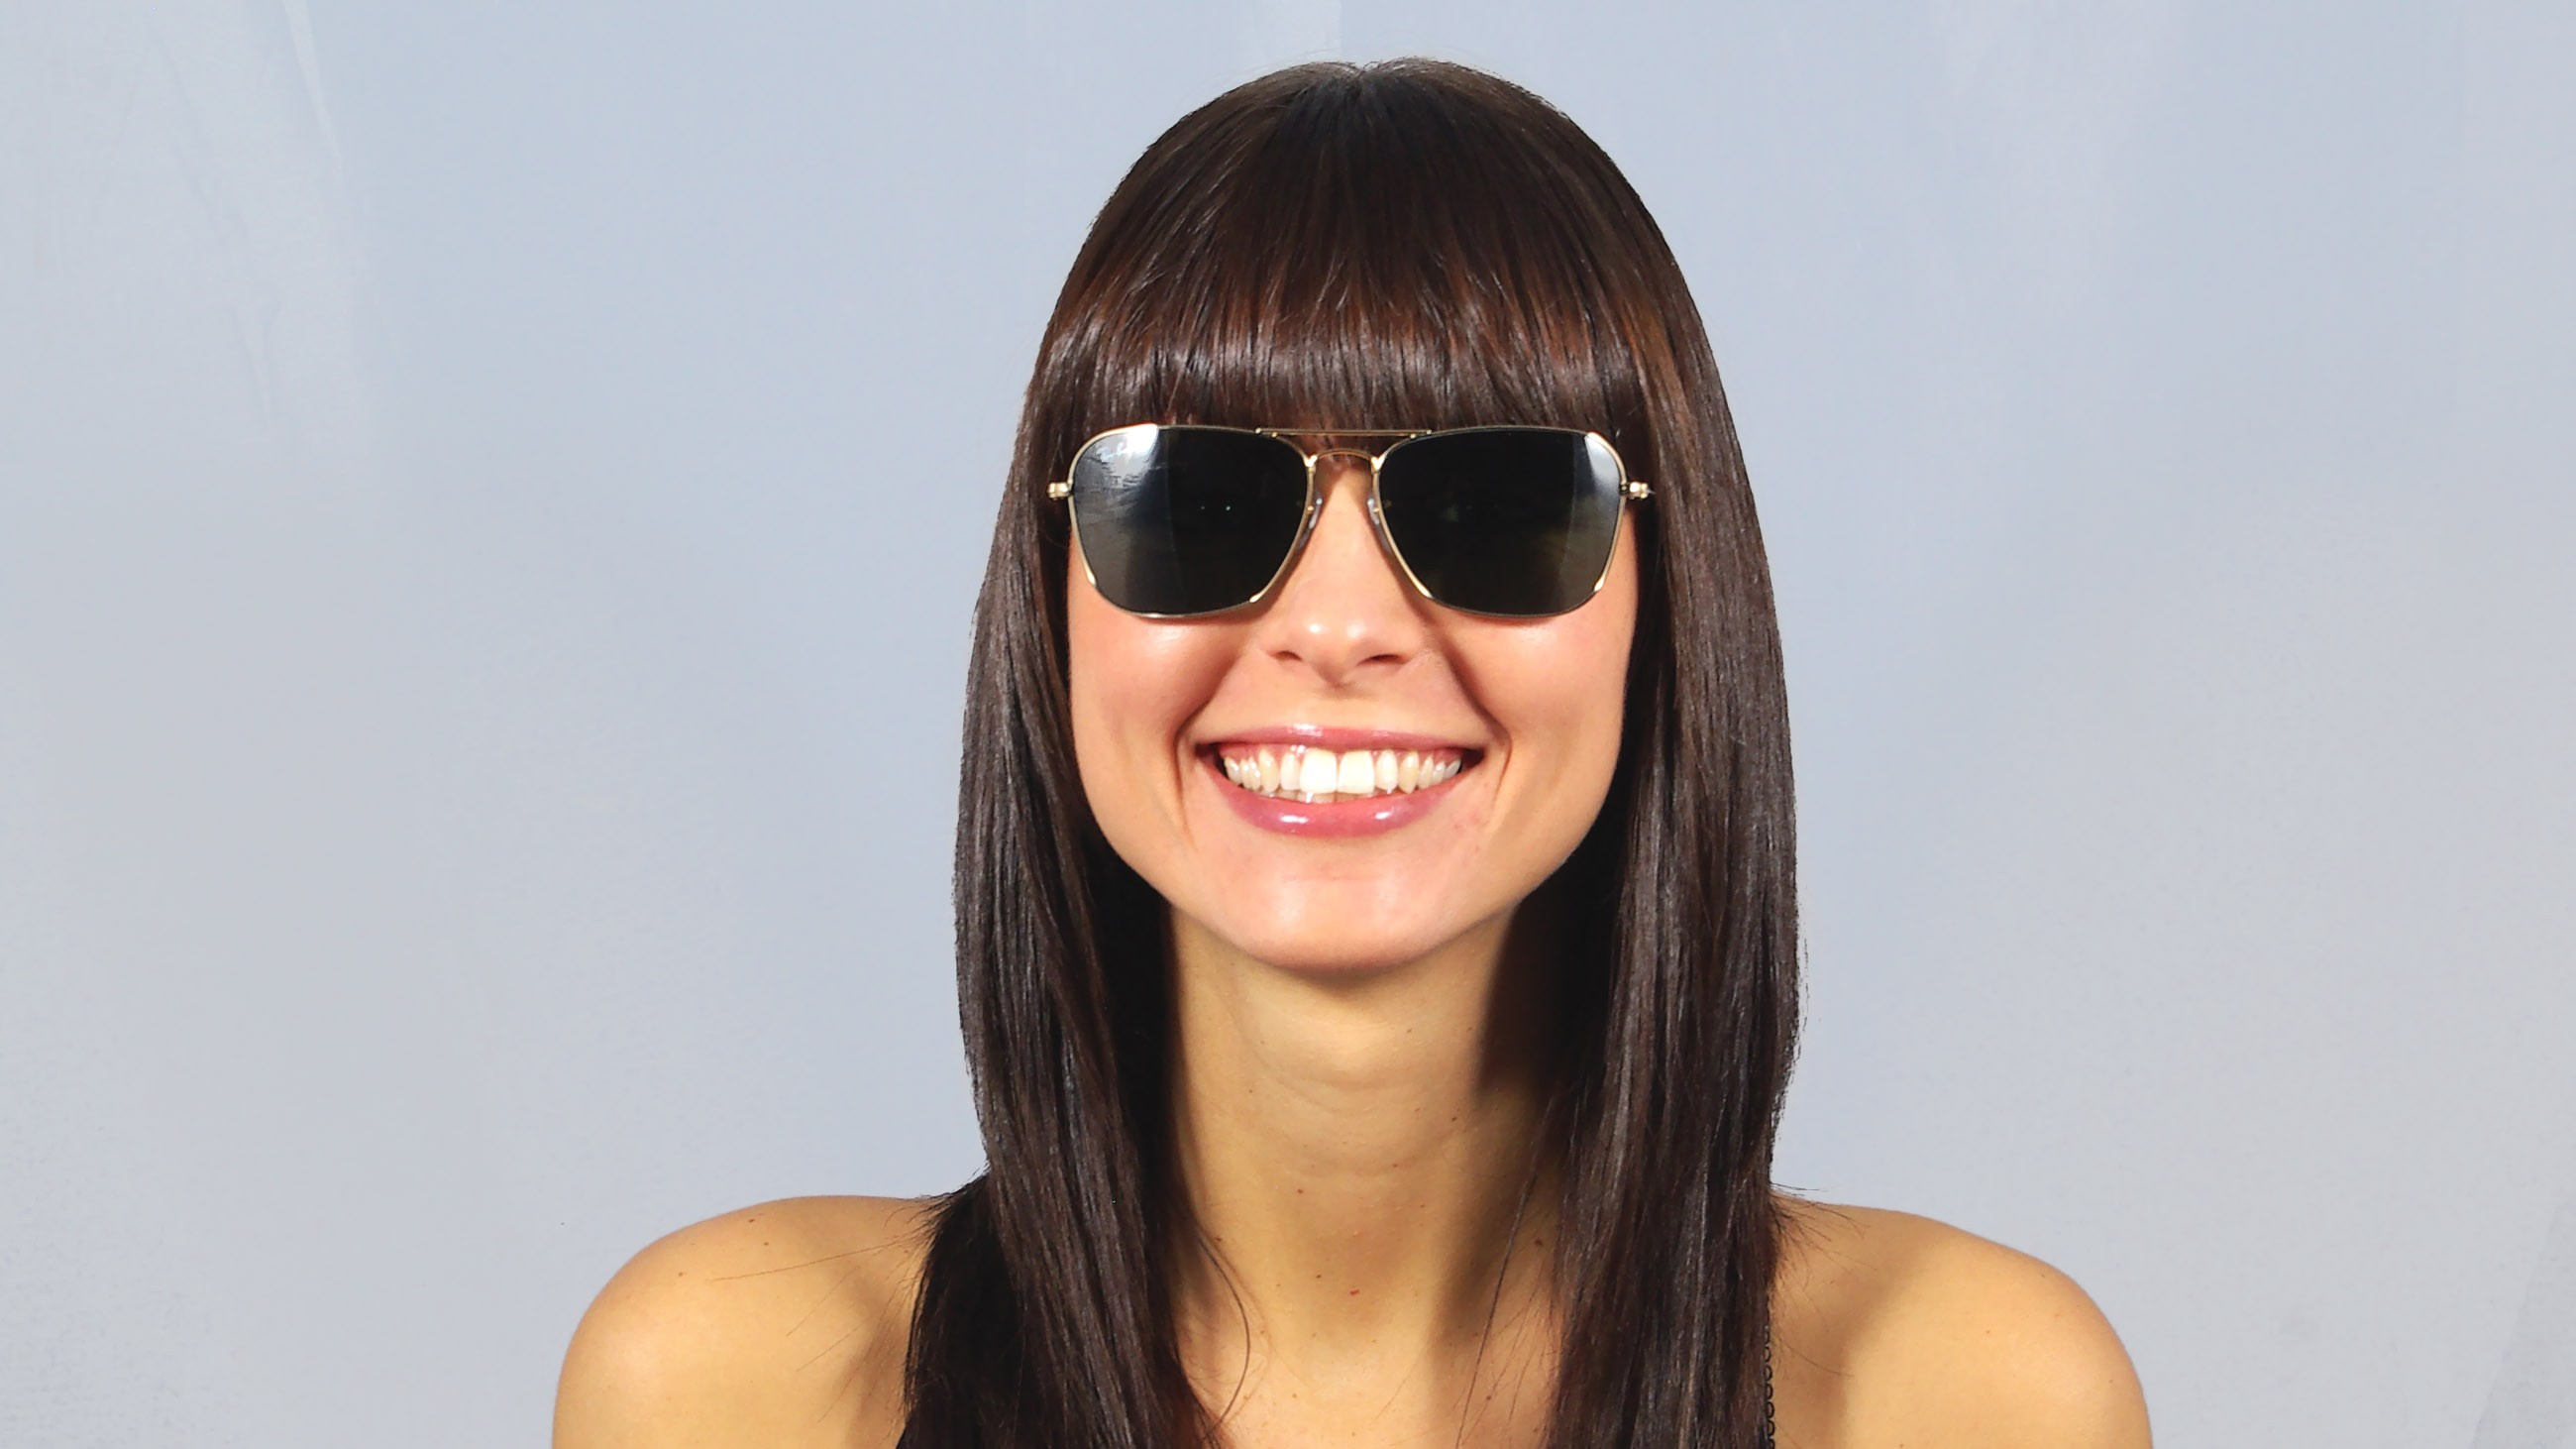 d52ad9dcb3328 Sunglasses Ray-Ban Caravan Gold G15 RB3136 001 58-15 Large